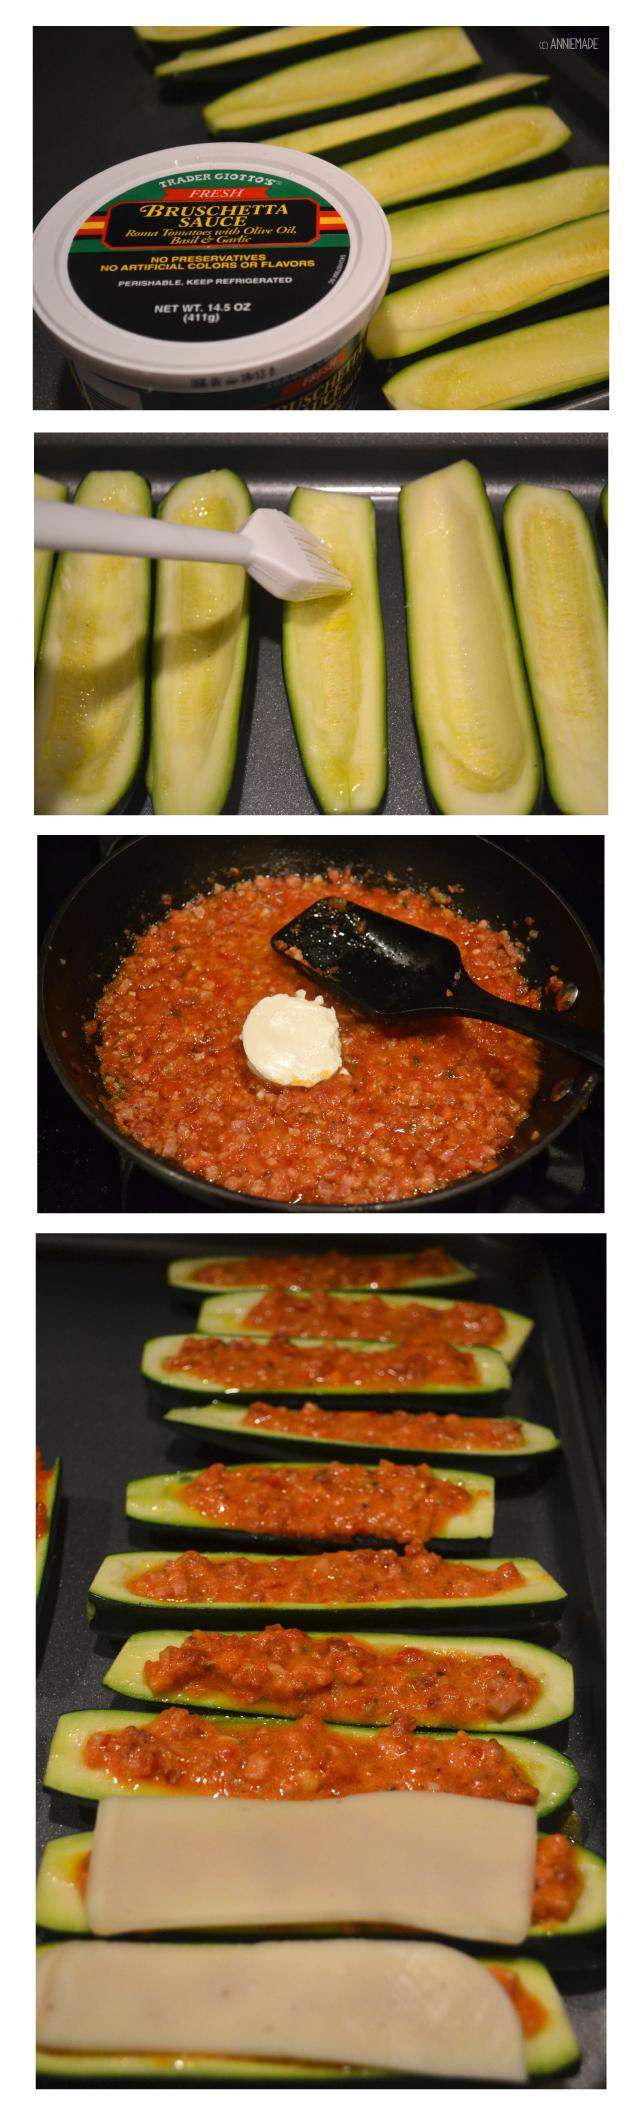 anniemade // Two Cheese Italian Stuffed Zucchini - Super easy recipe